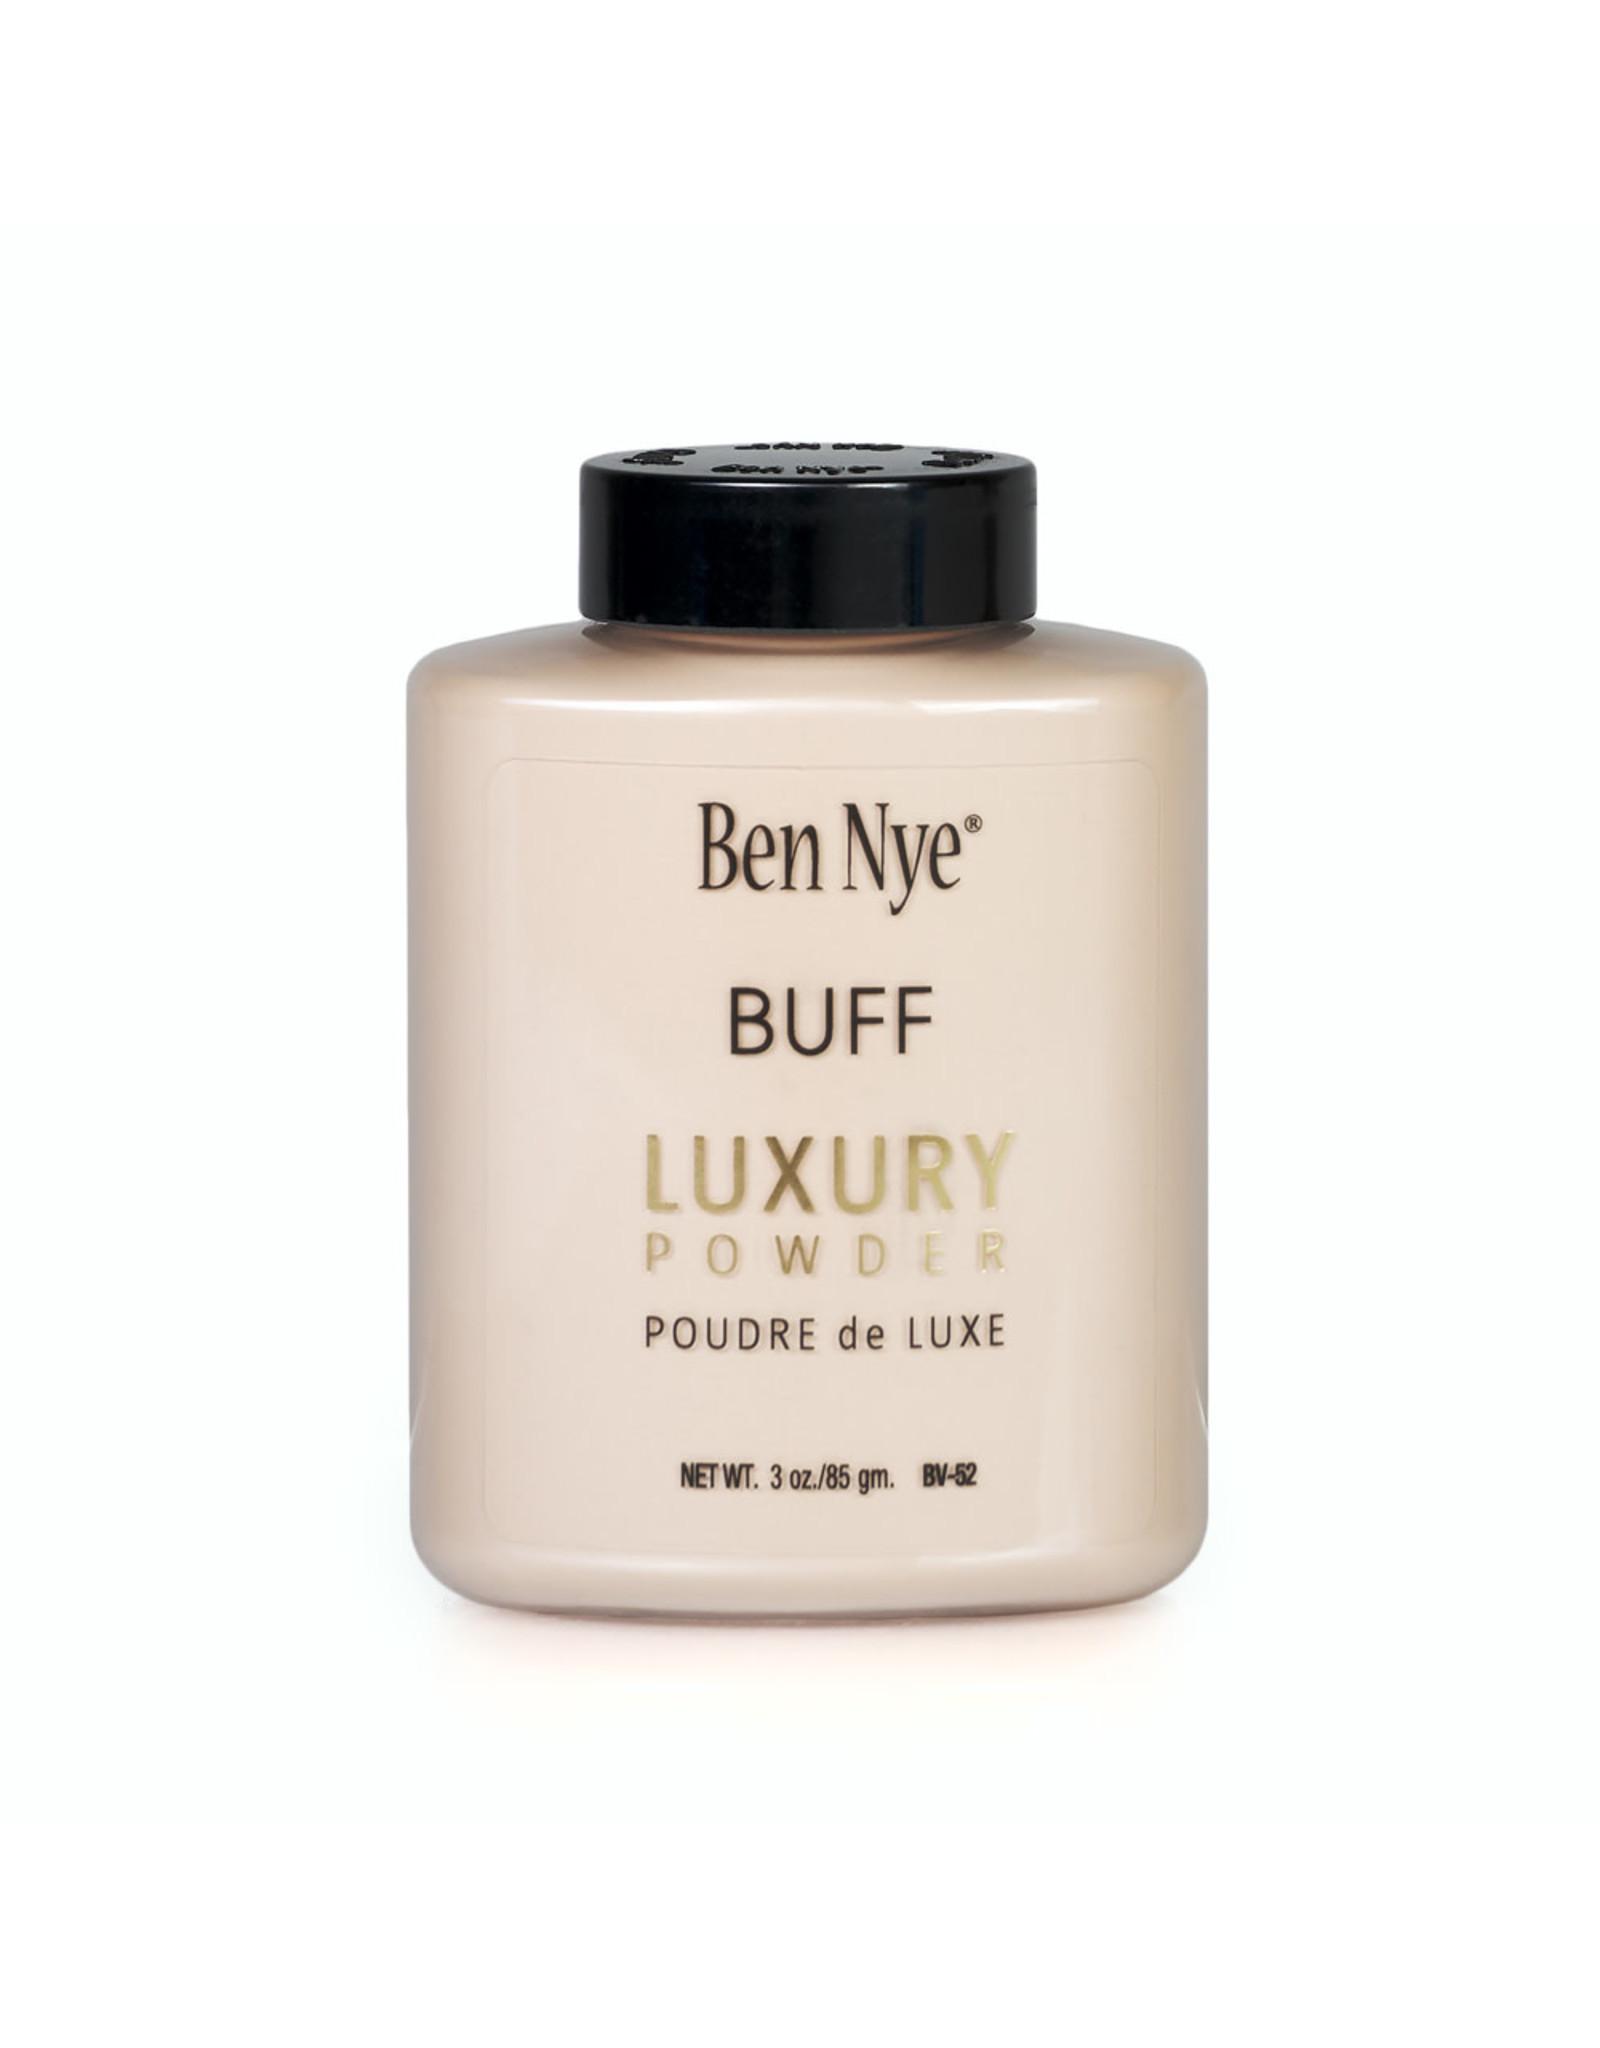 Ben Nye Ben Nye Buff Luxury Powder